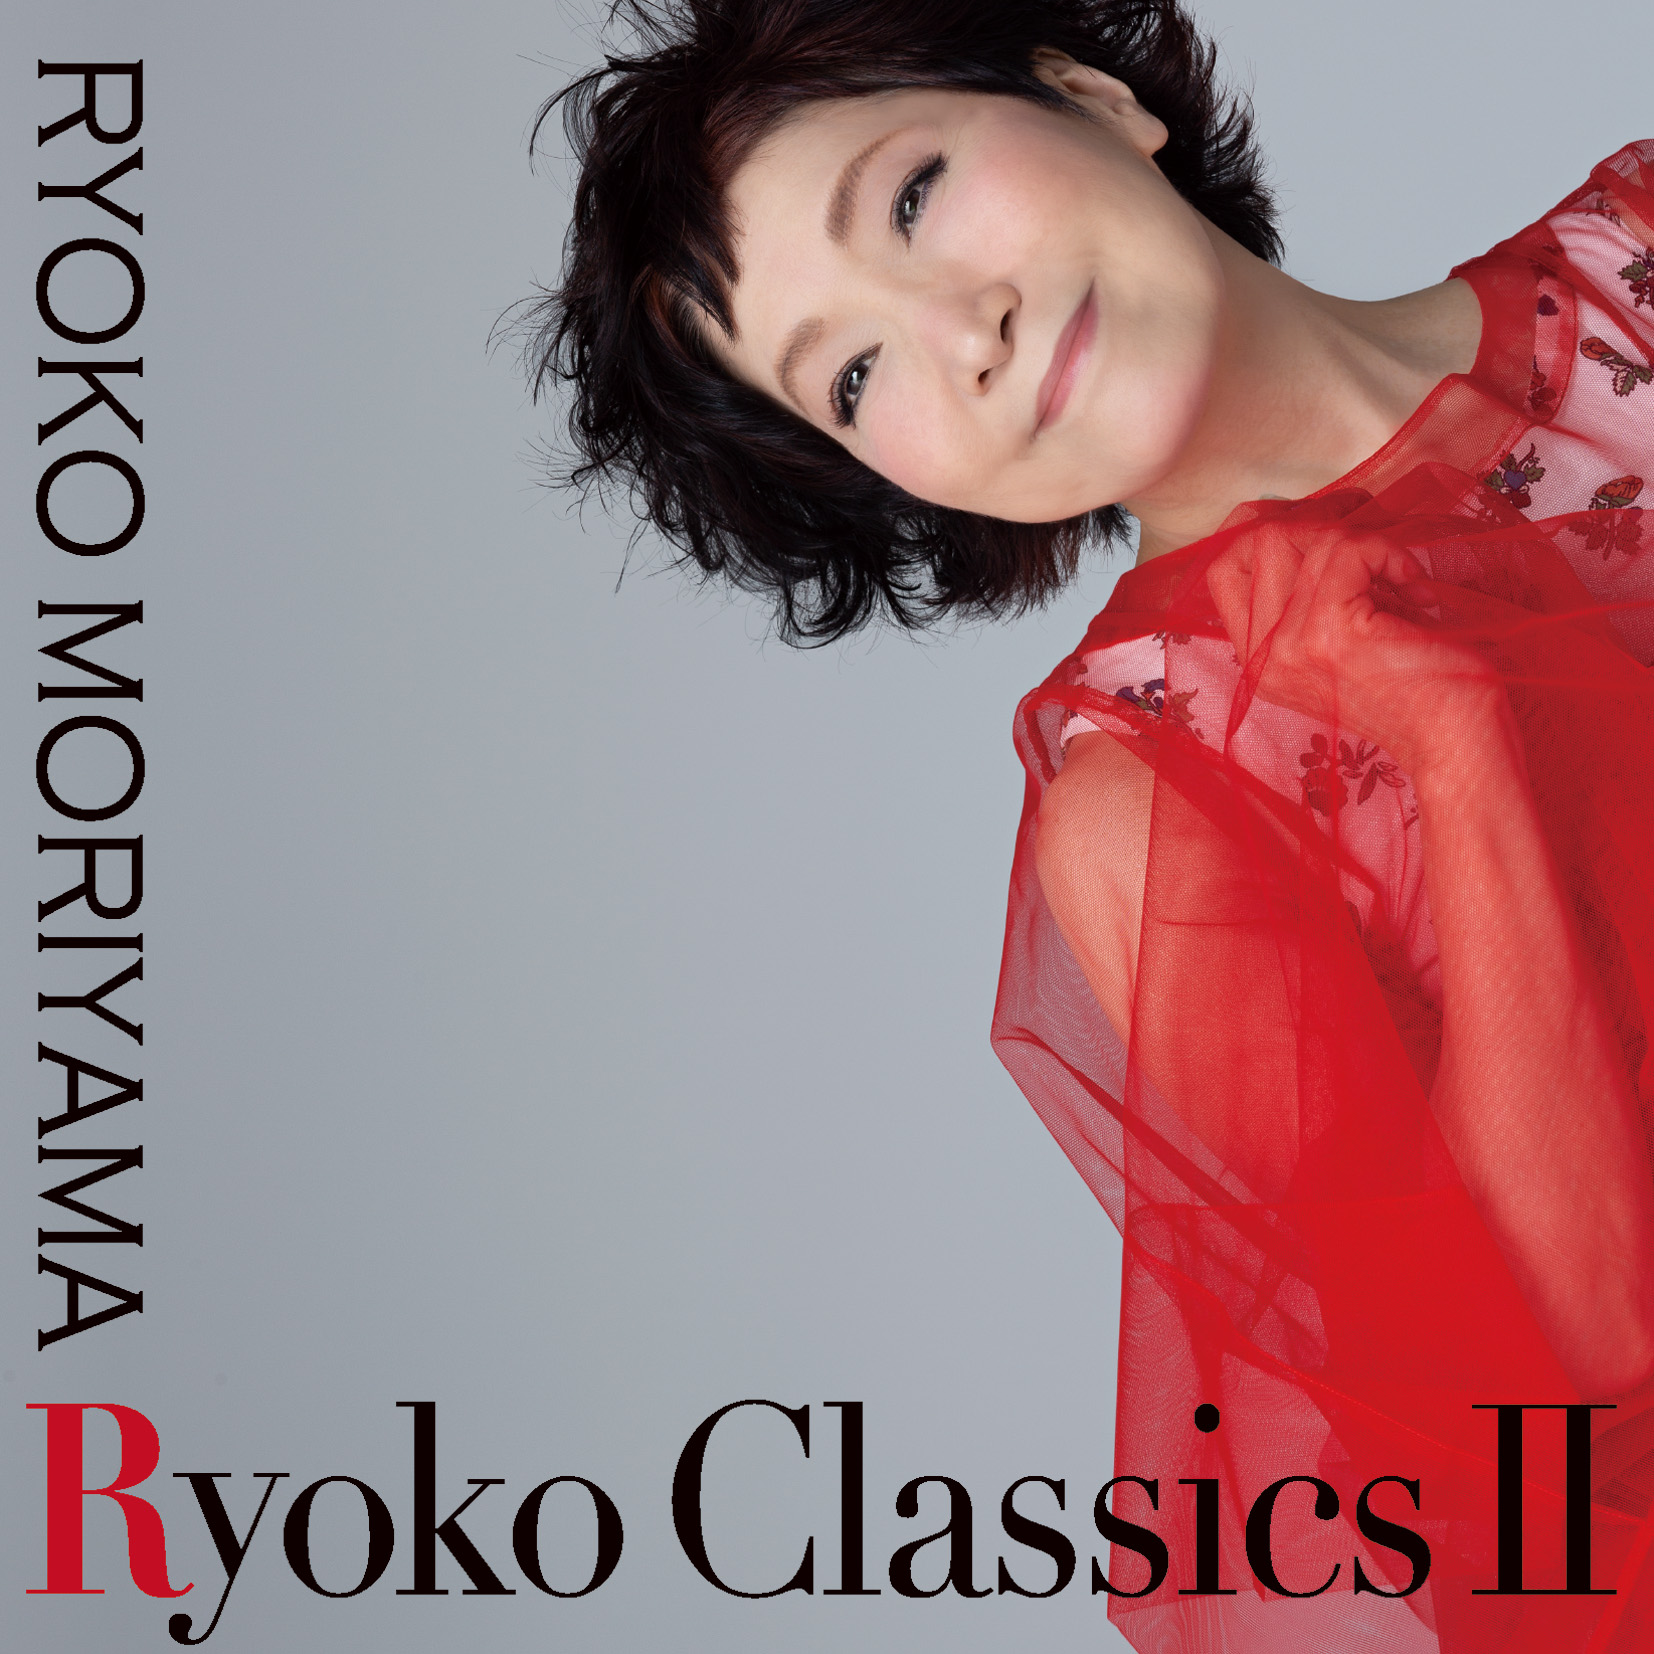 Ryoko ClassicsⅡ